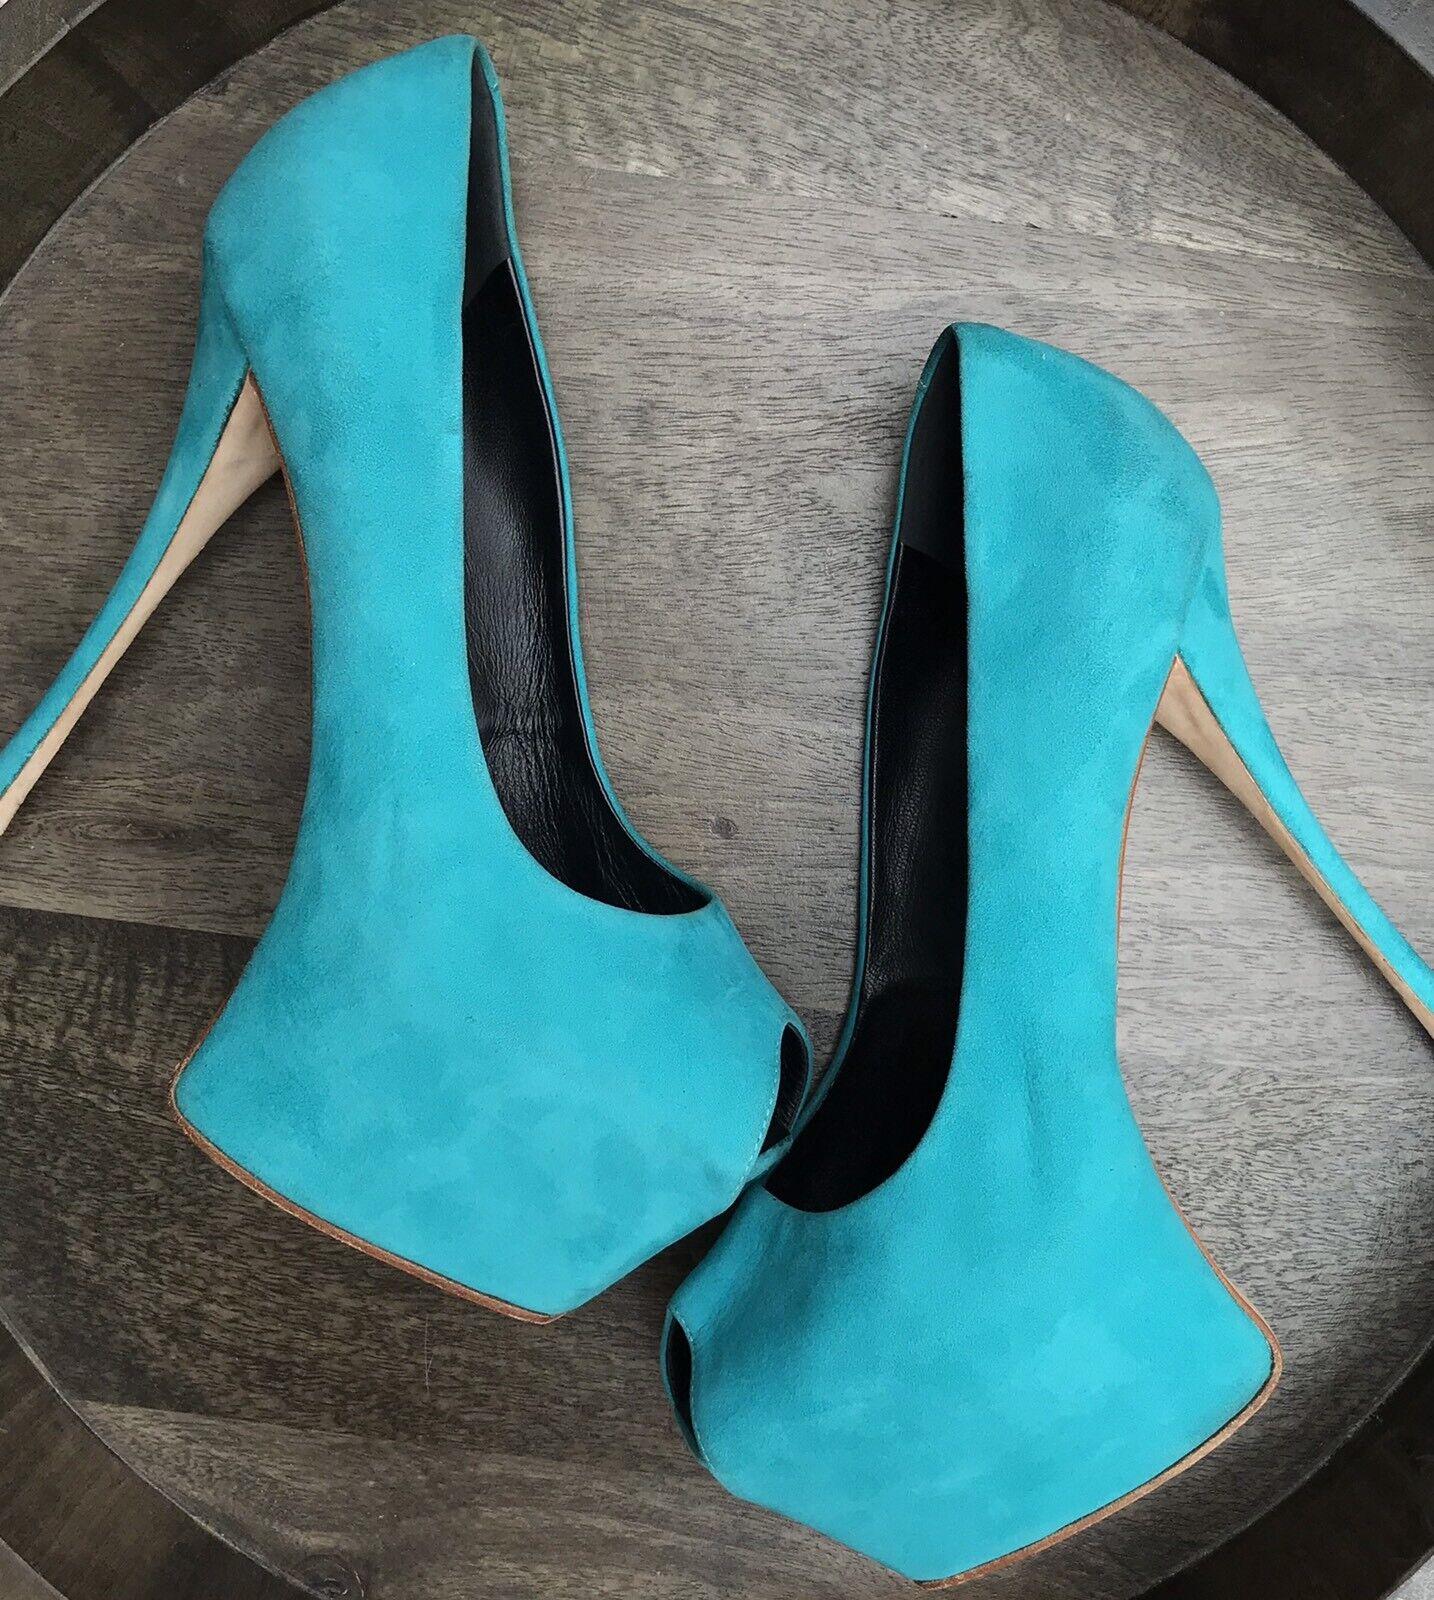 negozio online Giuseppe Zanotti Liza Dimensione 41 11 Platform Stillettos Heels Turquise Turquise Turquise Aqua blu  produttori fornitura diretta